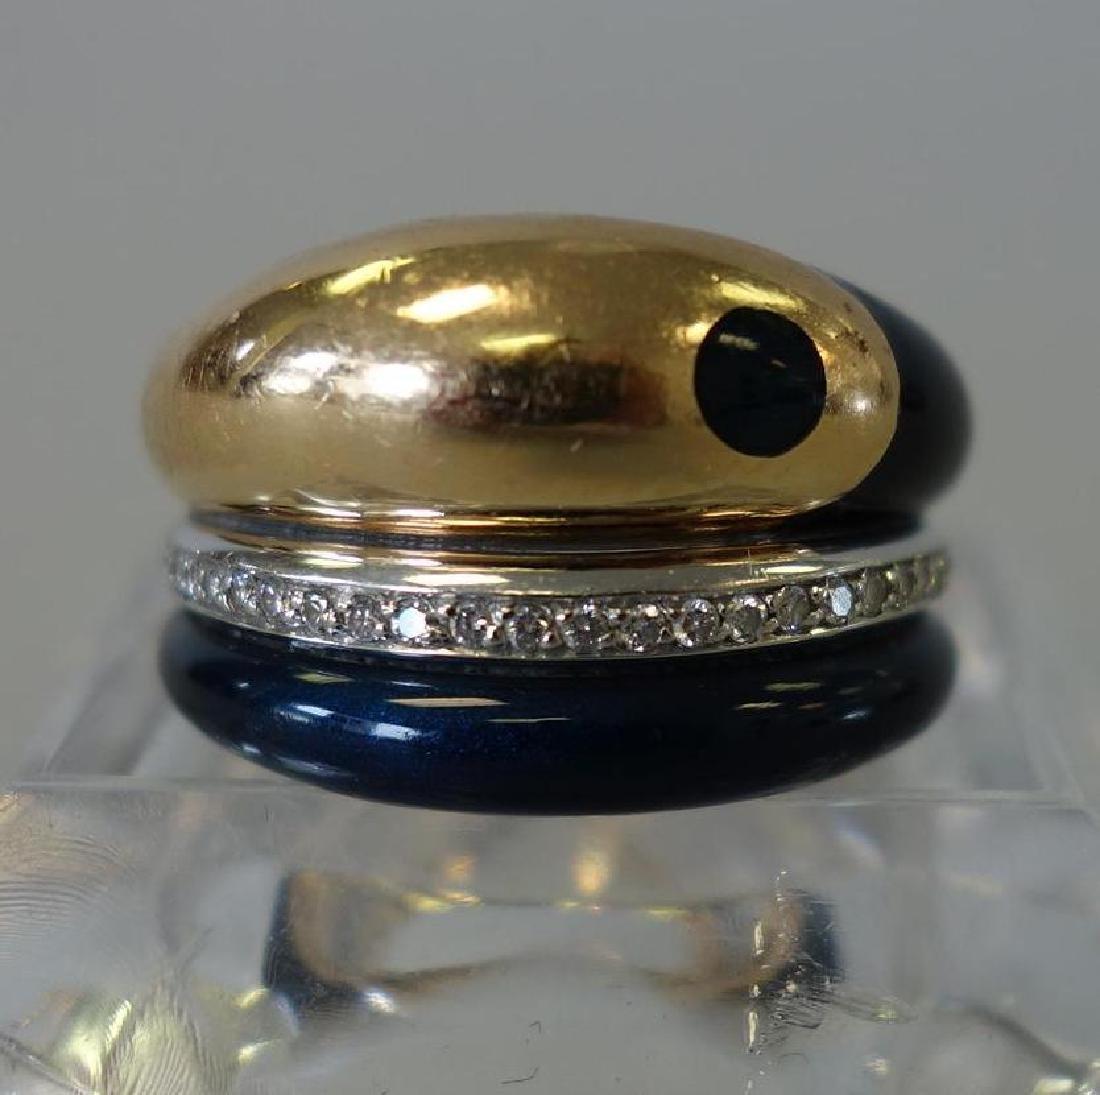 La Nouvelle Bague, 18K Gold, Diamond & Enamel Ring - 2